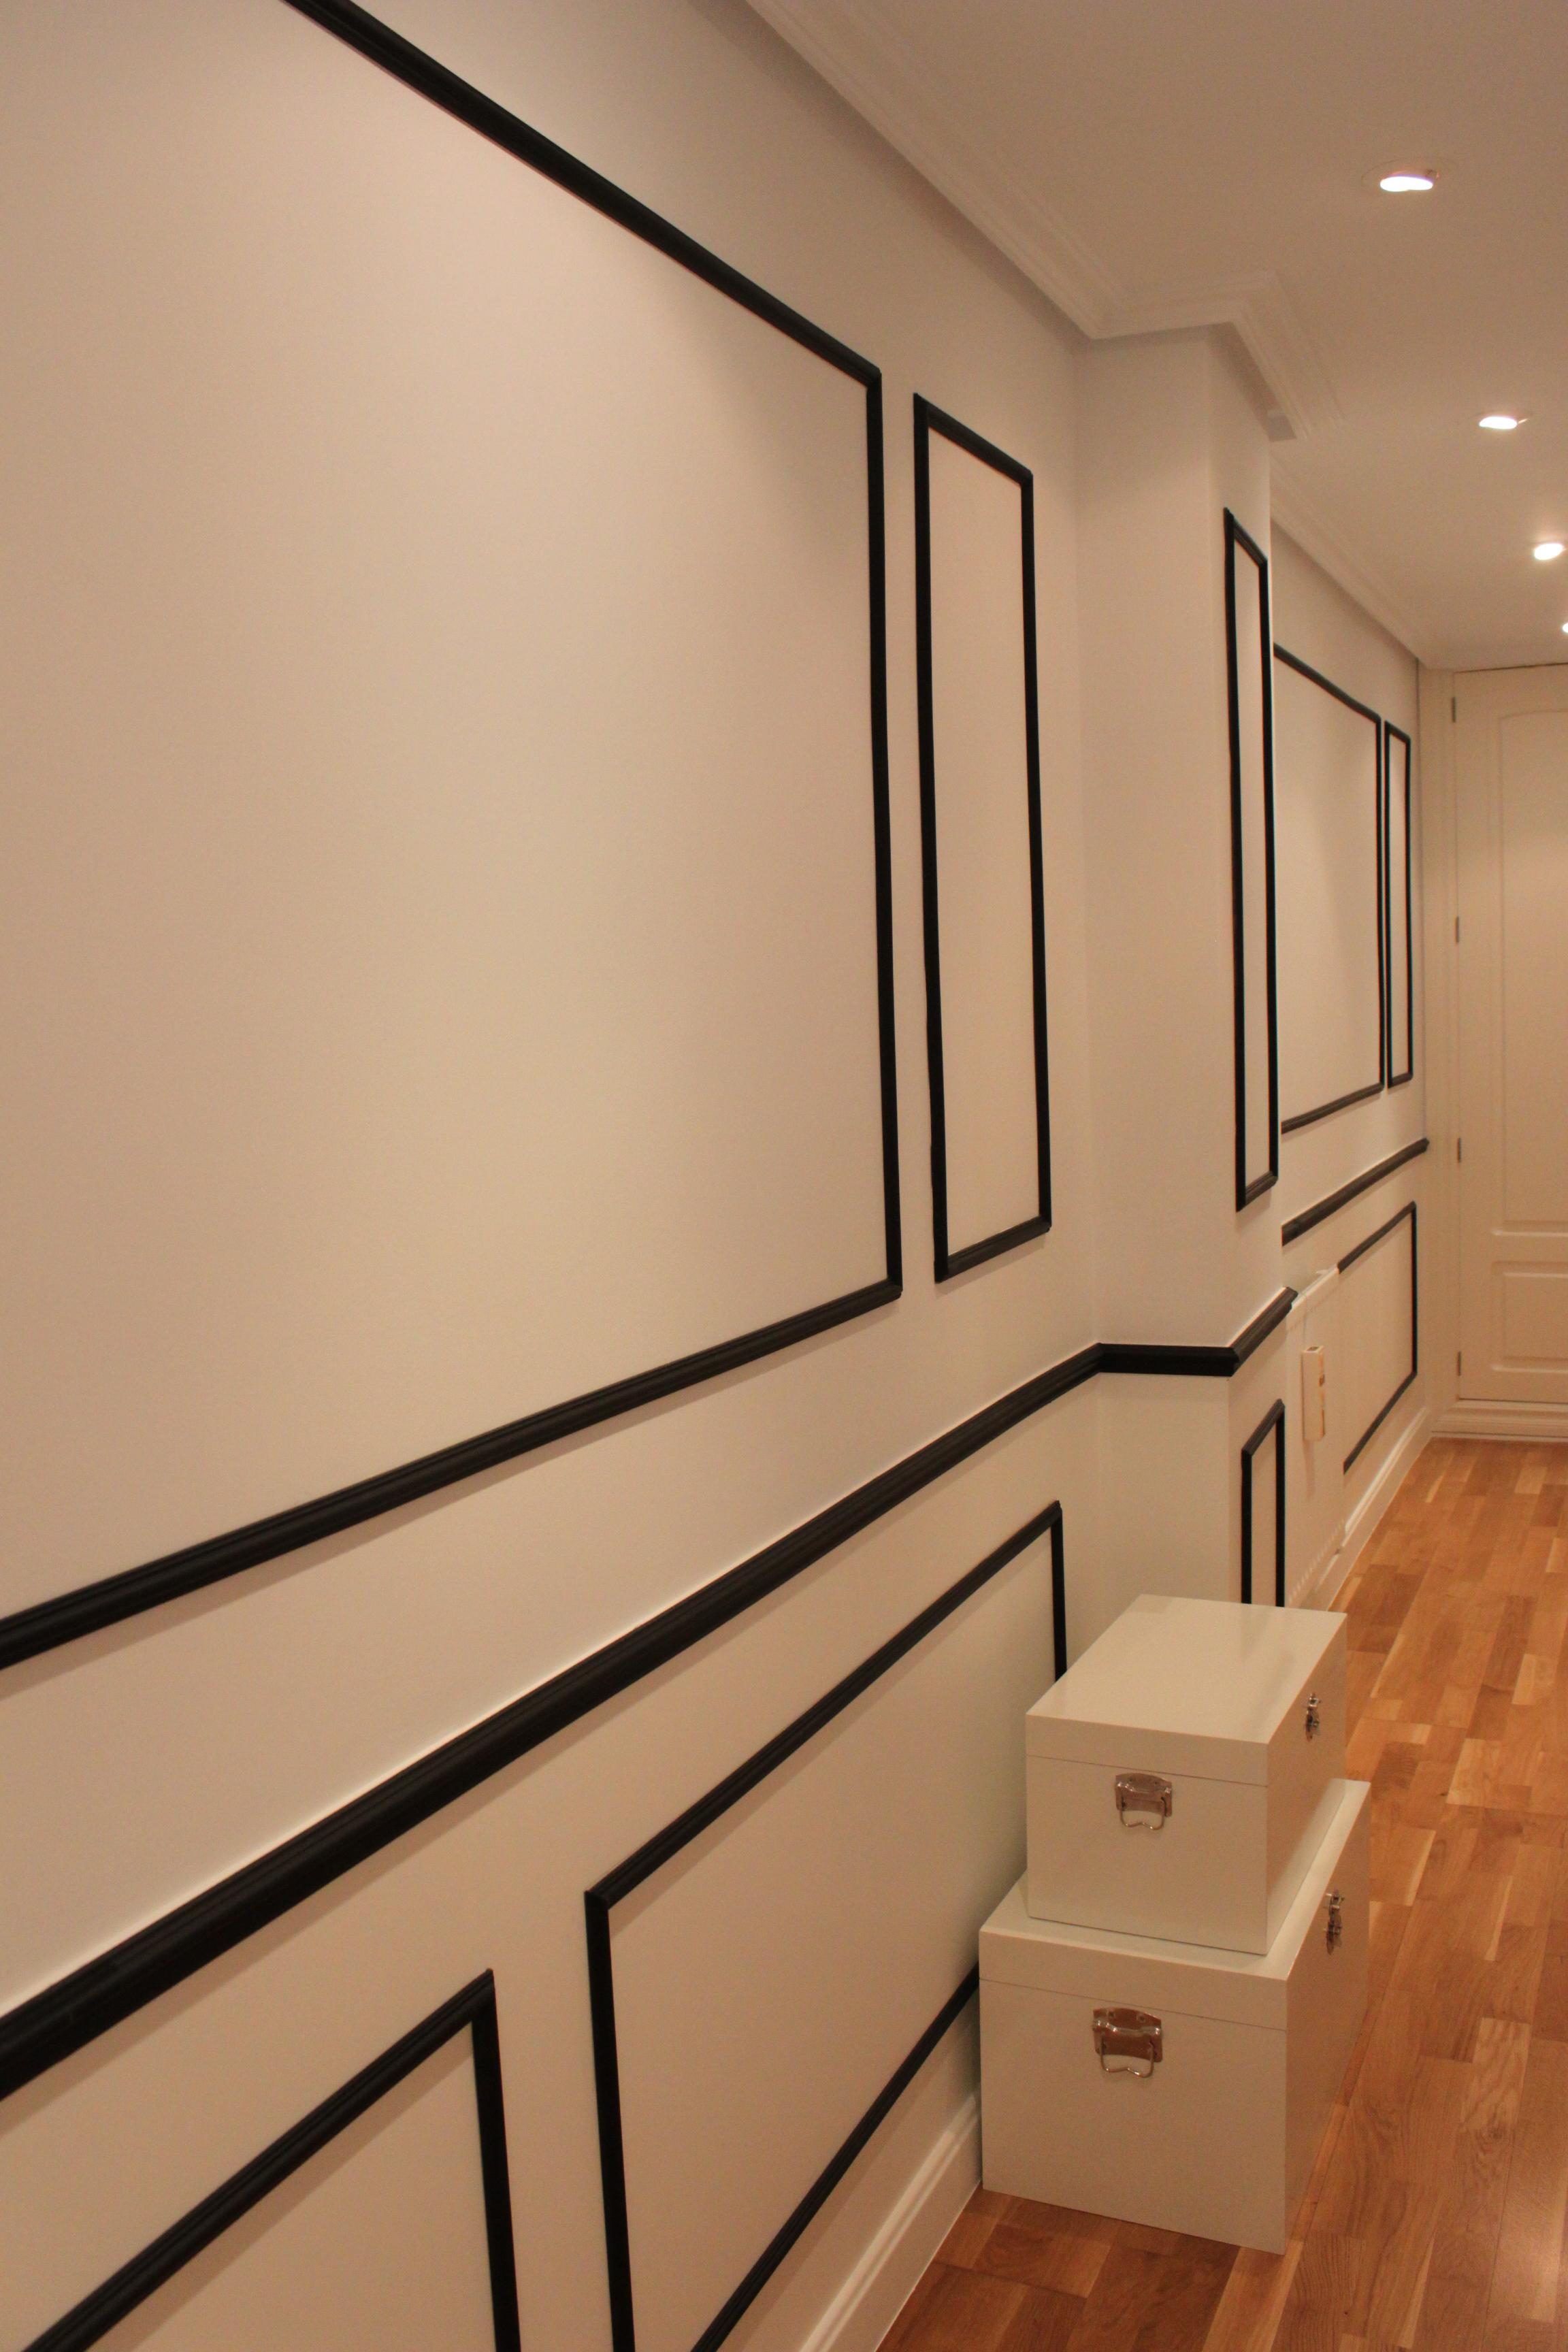 Pasillos pintados pasillos pintados pin it with papel - Papeles pintados para pasillos ...